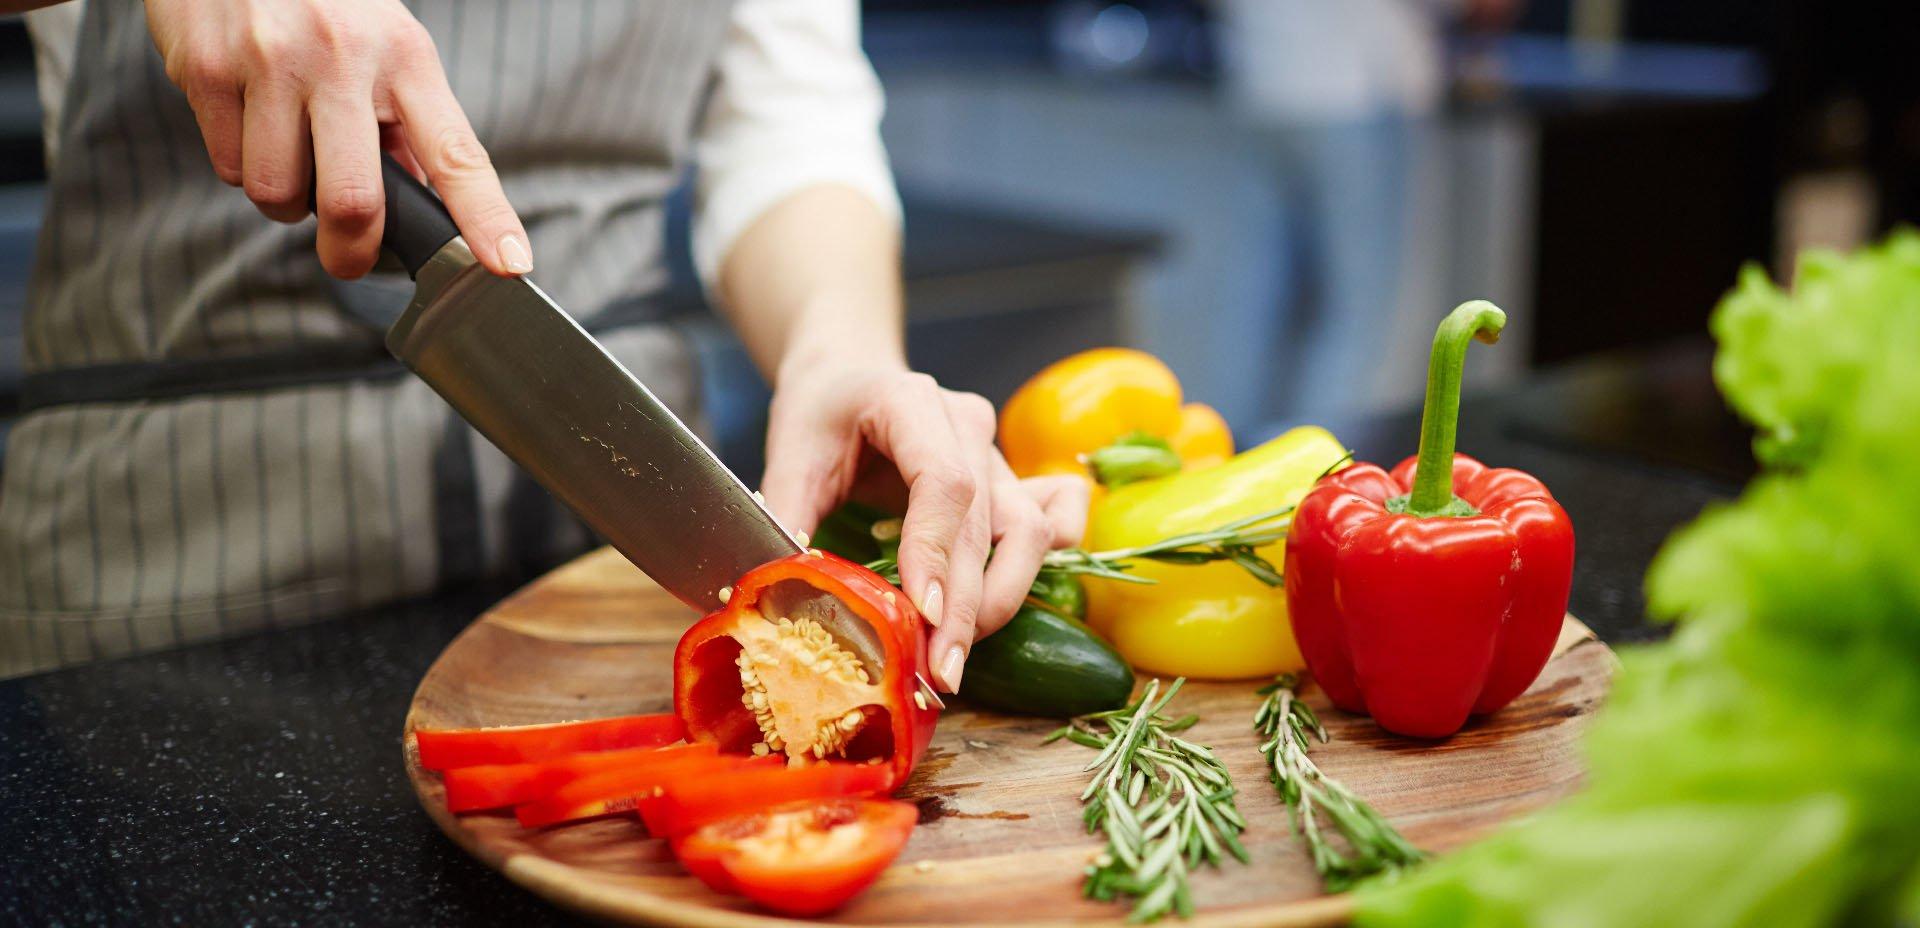 taglio di verdure